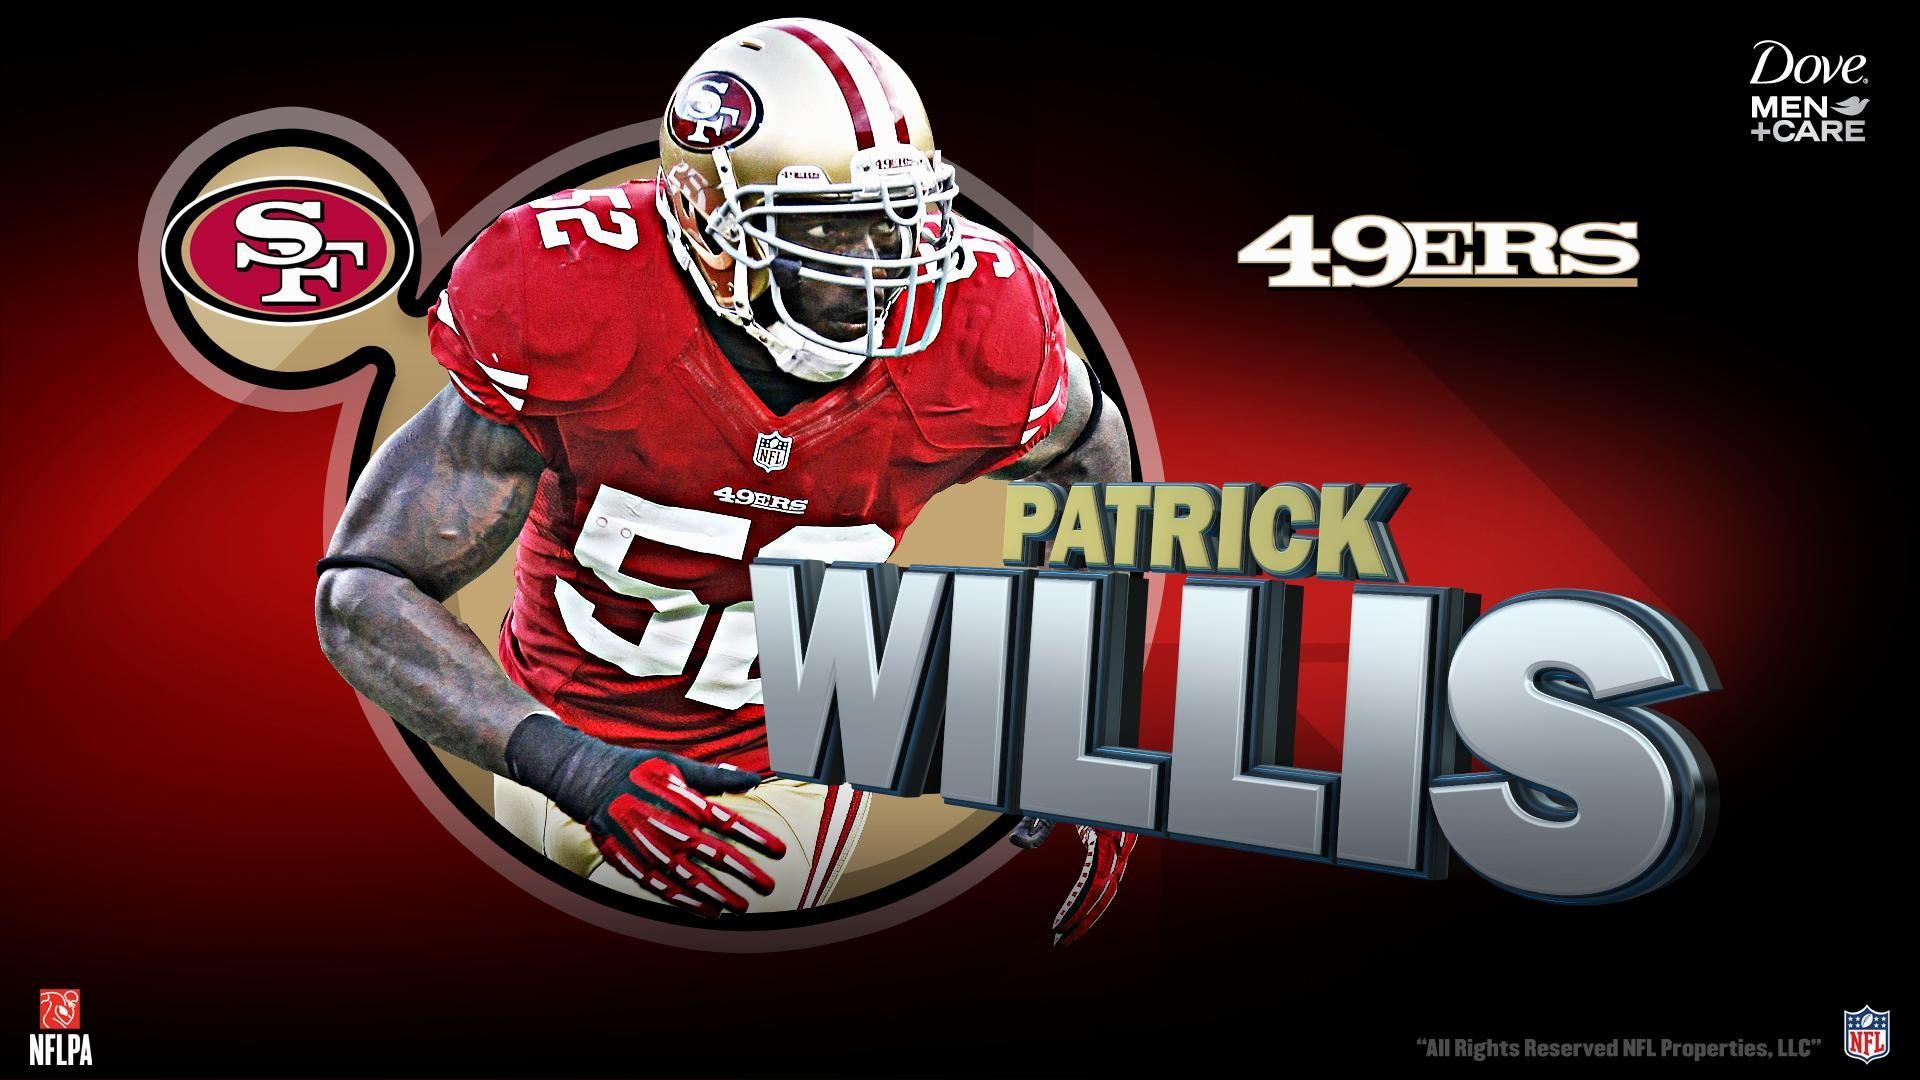 San-Francisco-49ers-Player-Wallpaper